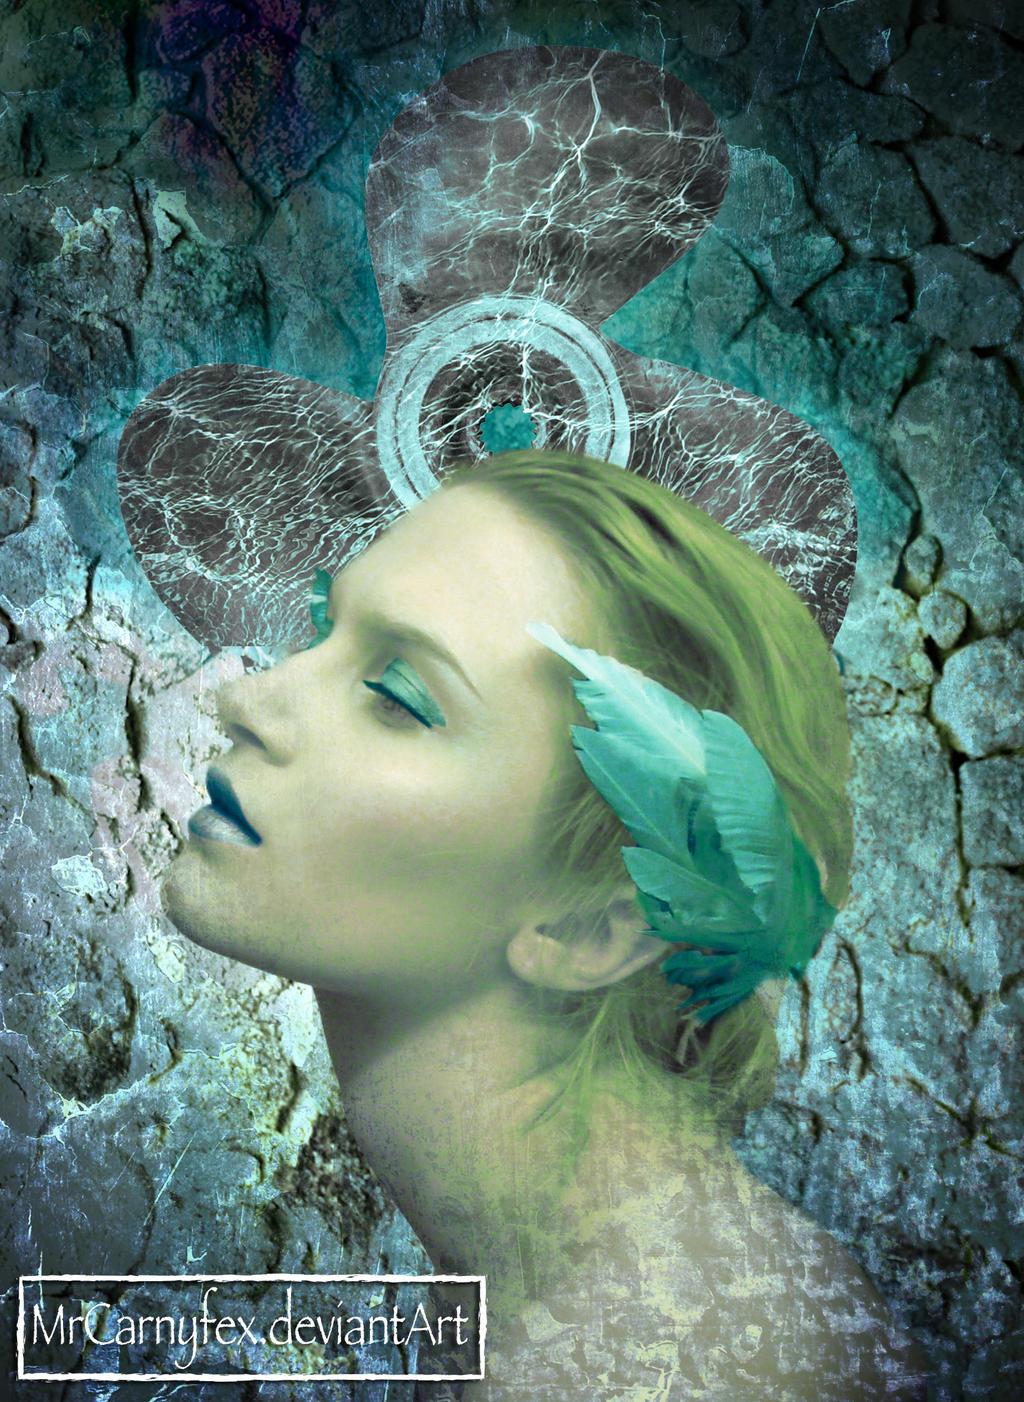 Deep Sea Siren by MrCarnyfex